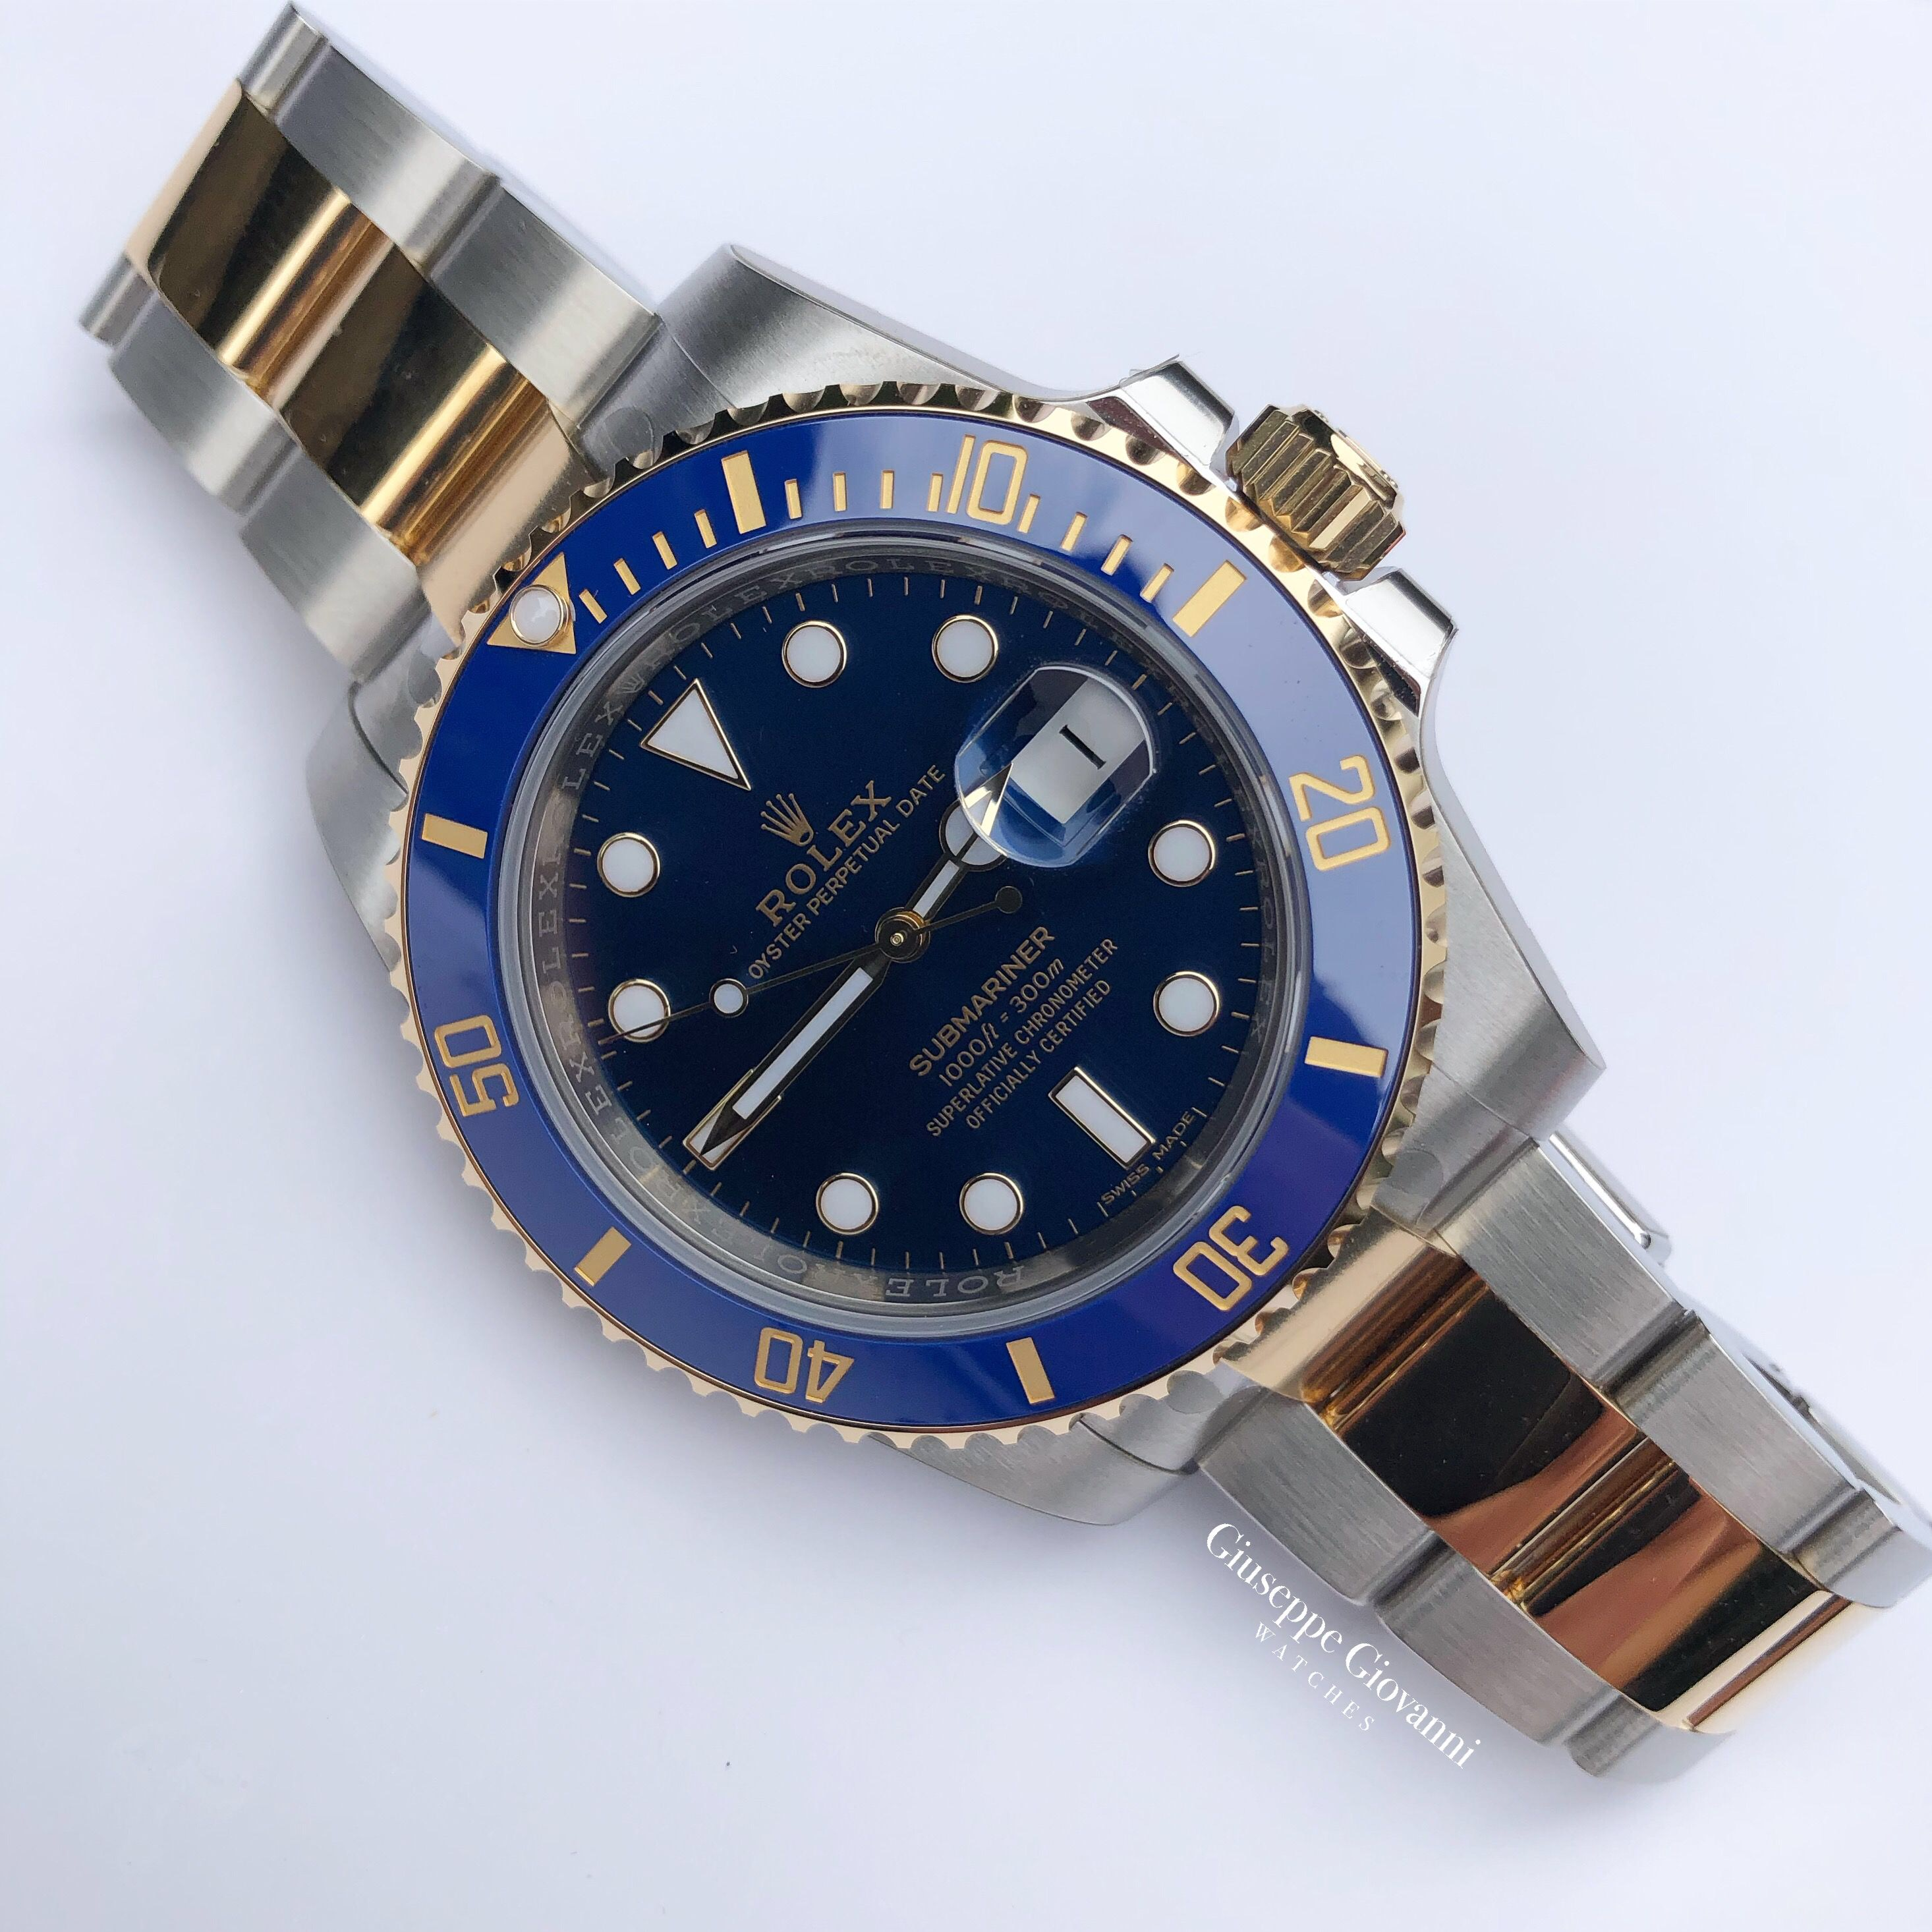 25 Rolex Submariner 116613LB YellowGoldOystersteel OysterBracelet BlueDial